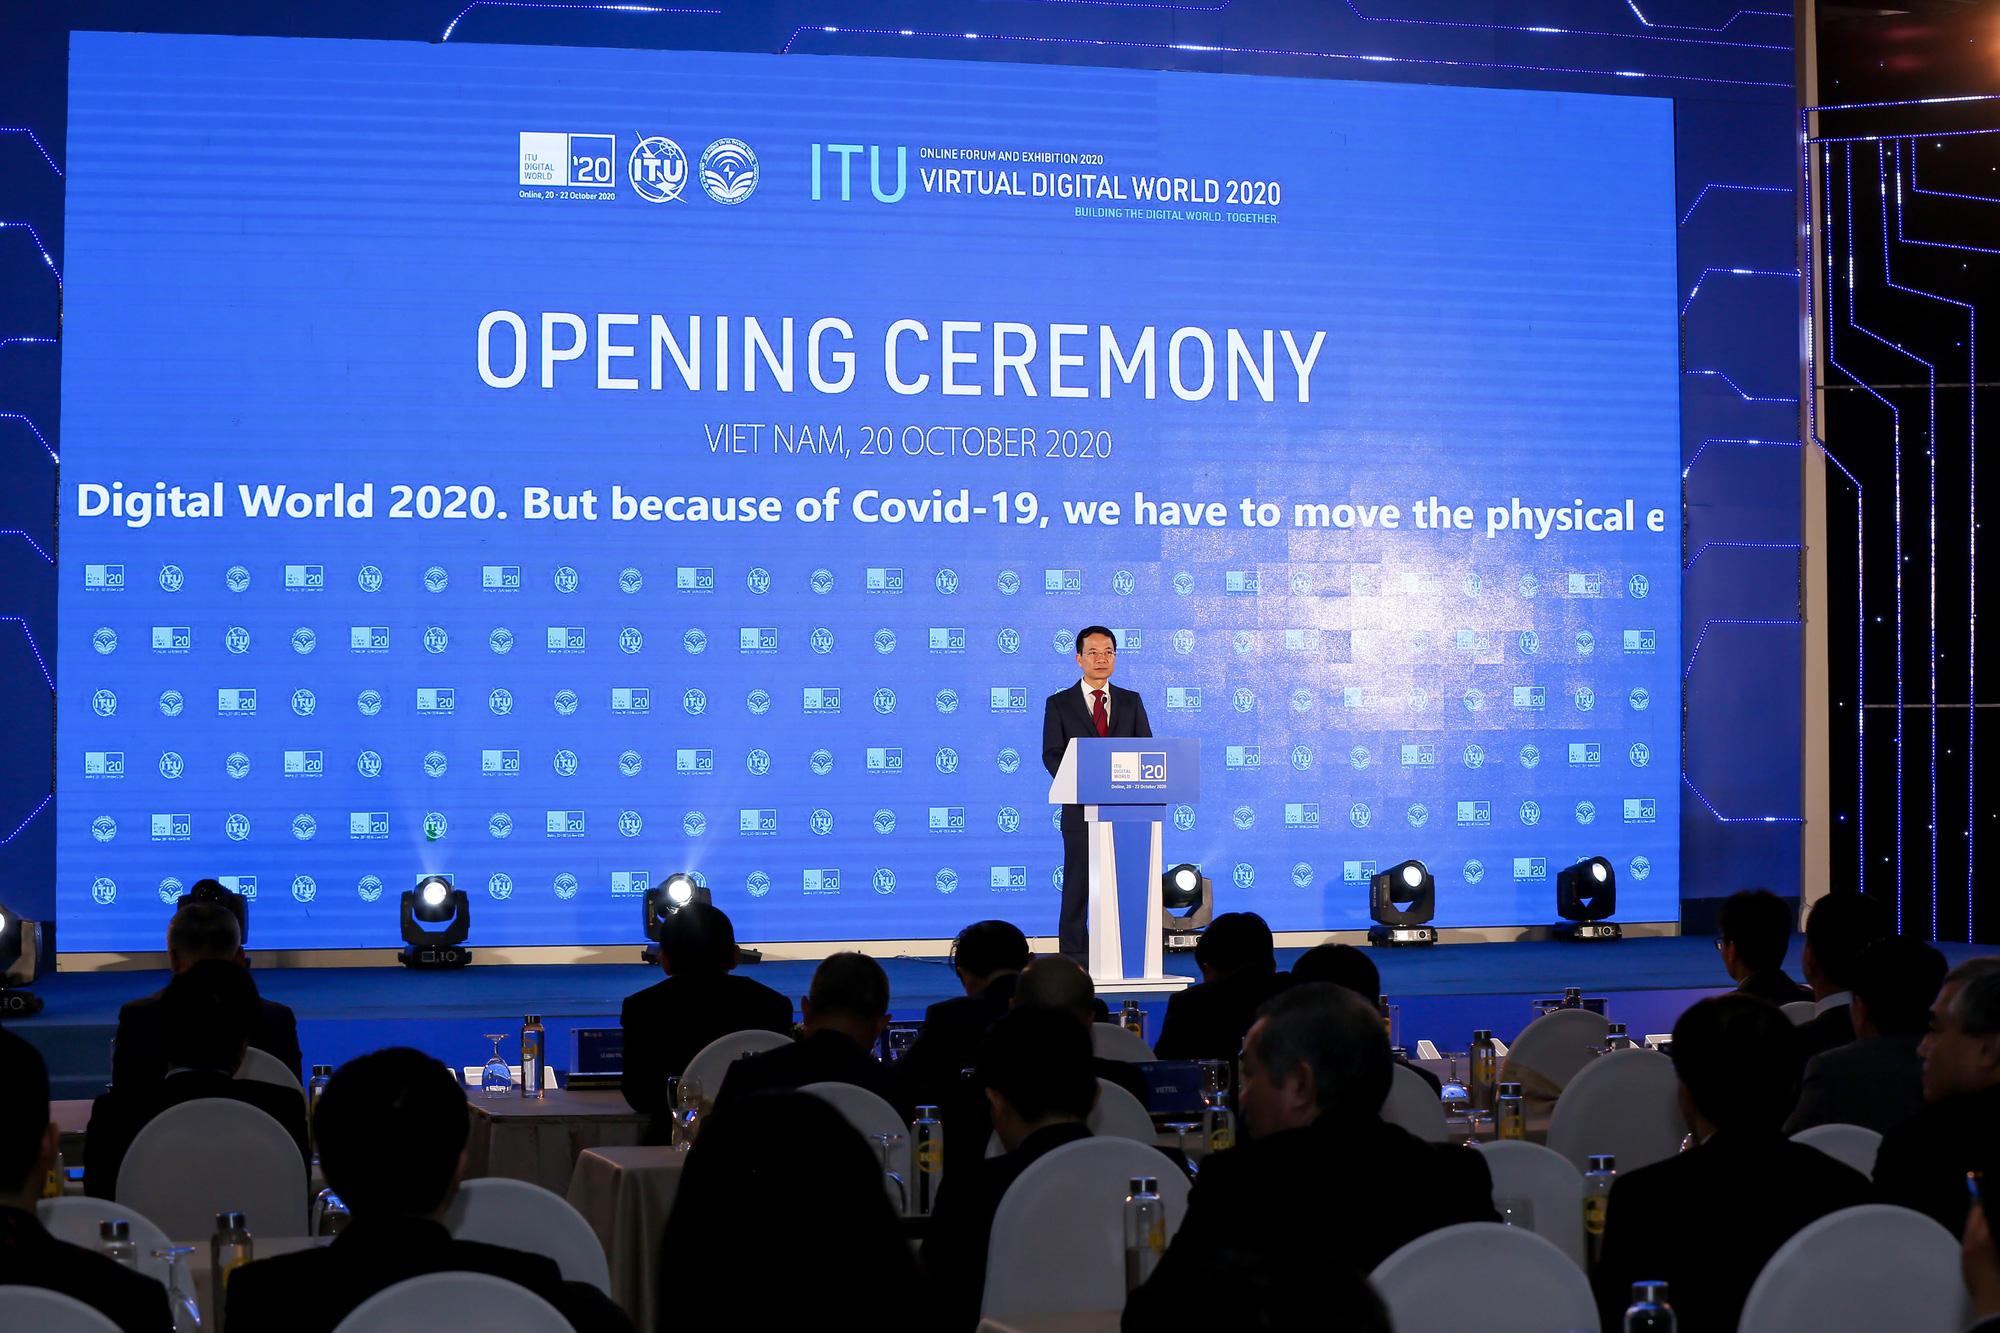 Vietnam co-organizes online global digital event